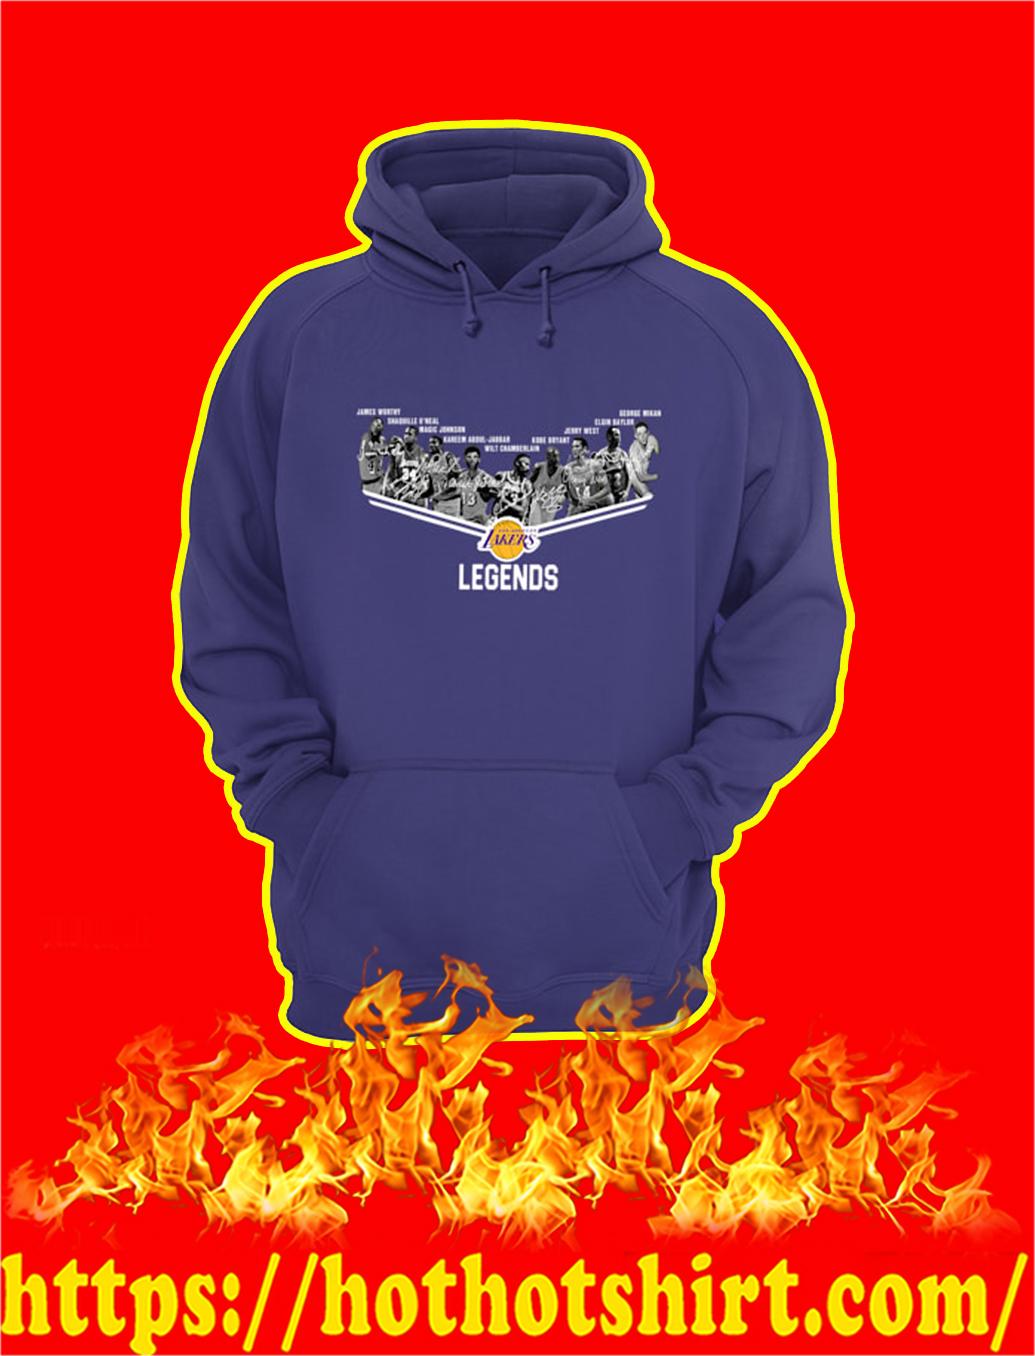 Los Angeles Lakers Legends Signature hoodie